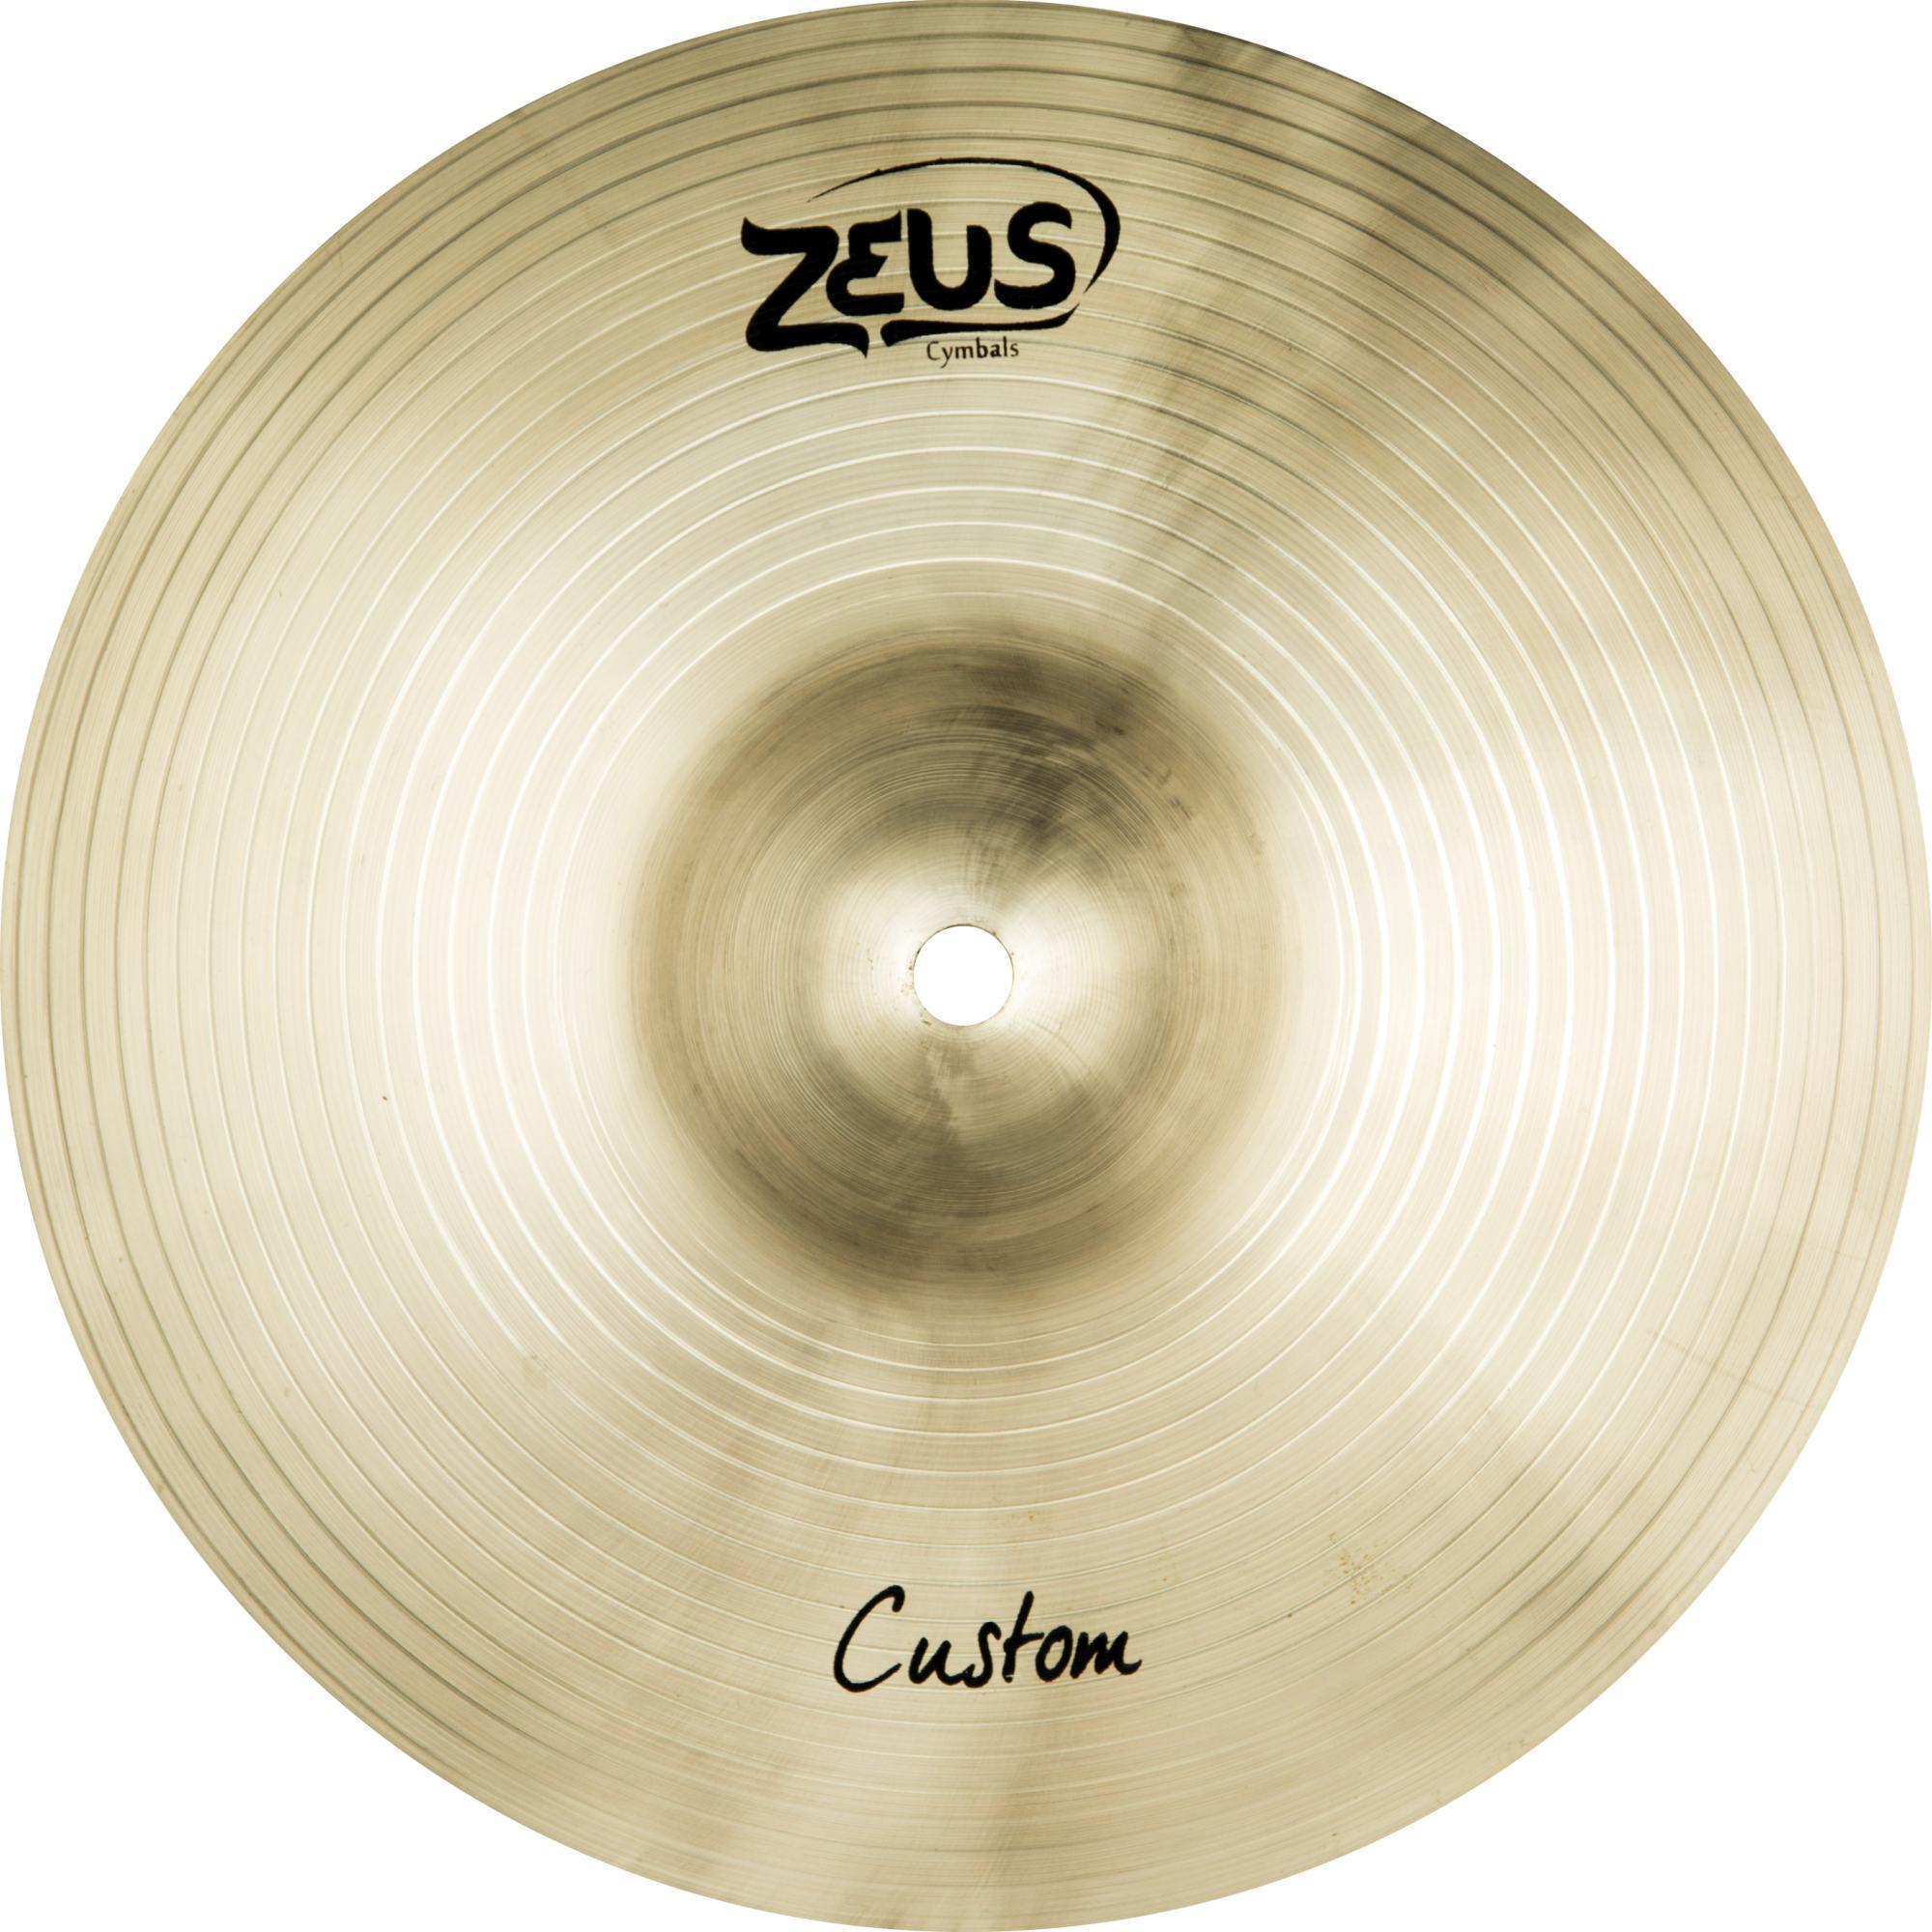 Prato Zeus Custom Splash 6 Zcs6